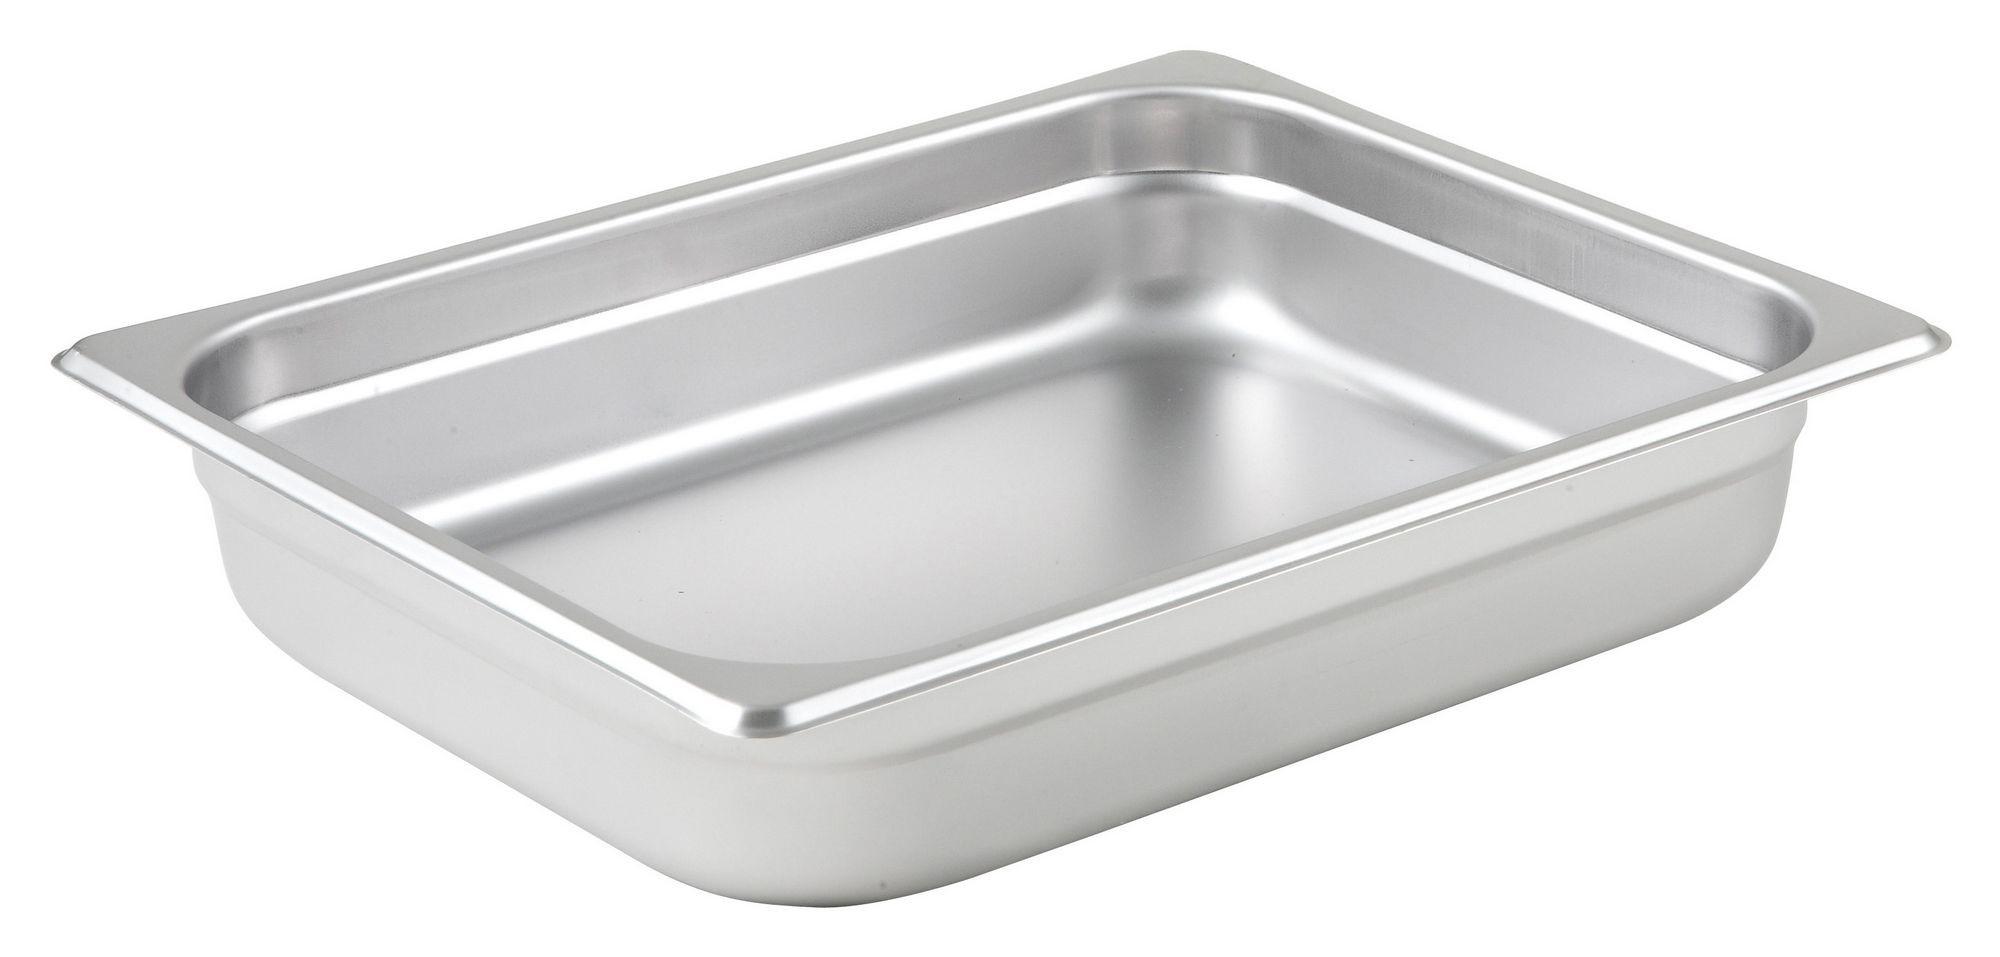 "Winco Spjl-202 1/2 Size Anti-Jam 25 Gauge Steam Table Pan 2-1/2"" Deep"